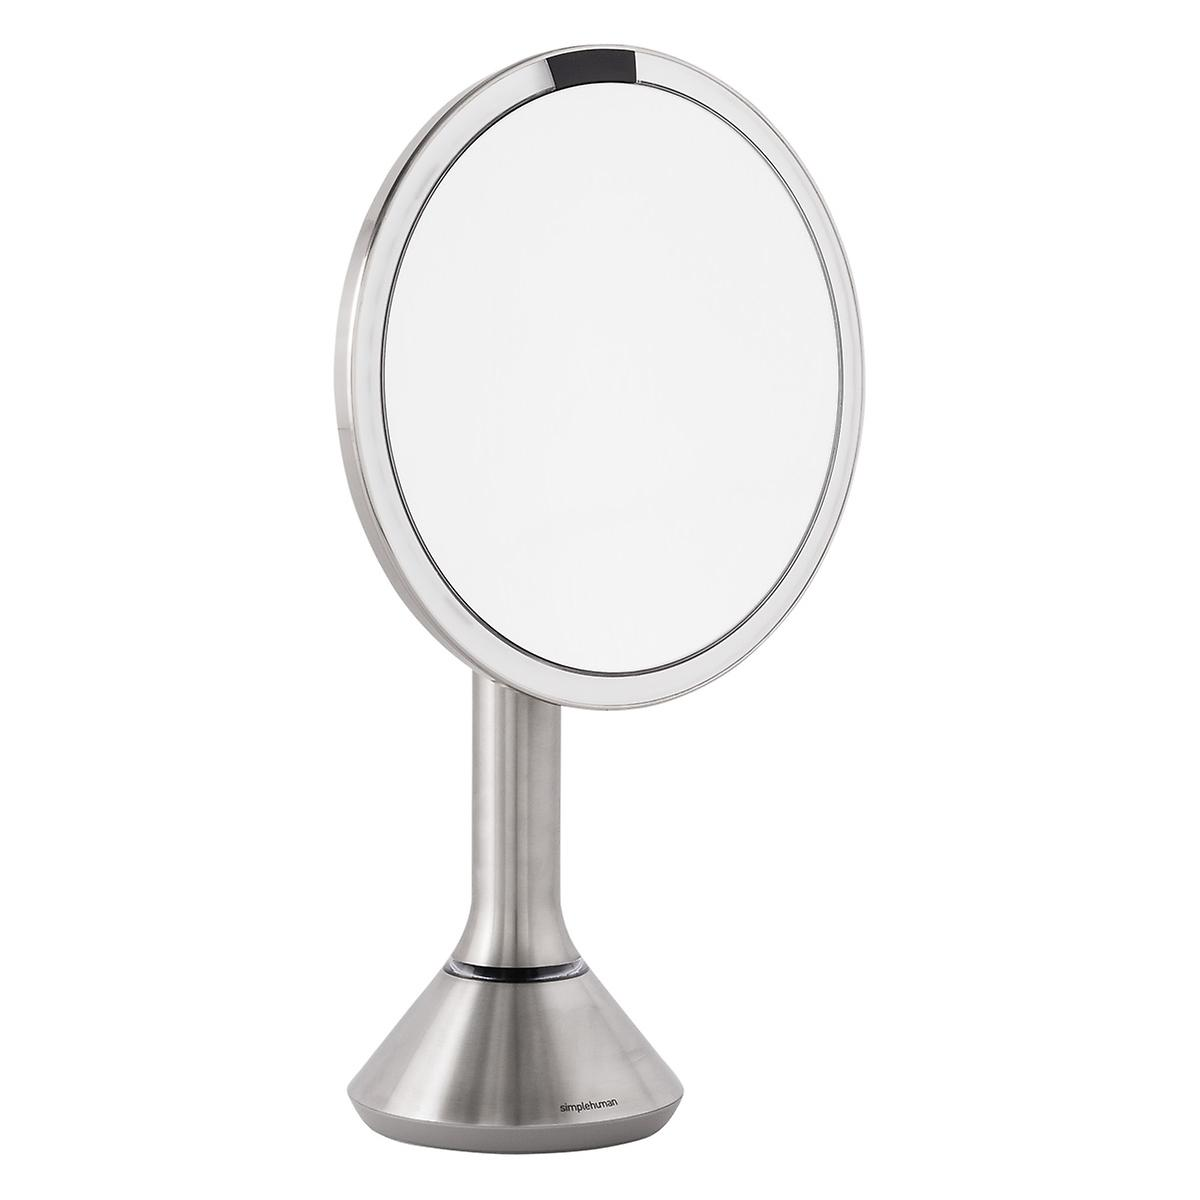 simplehuman 5X Touch Control Sensor Mirror